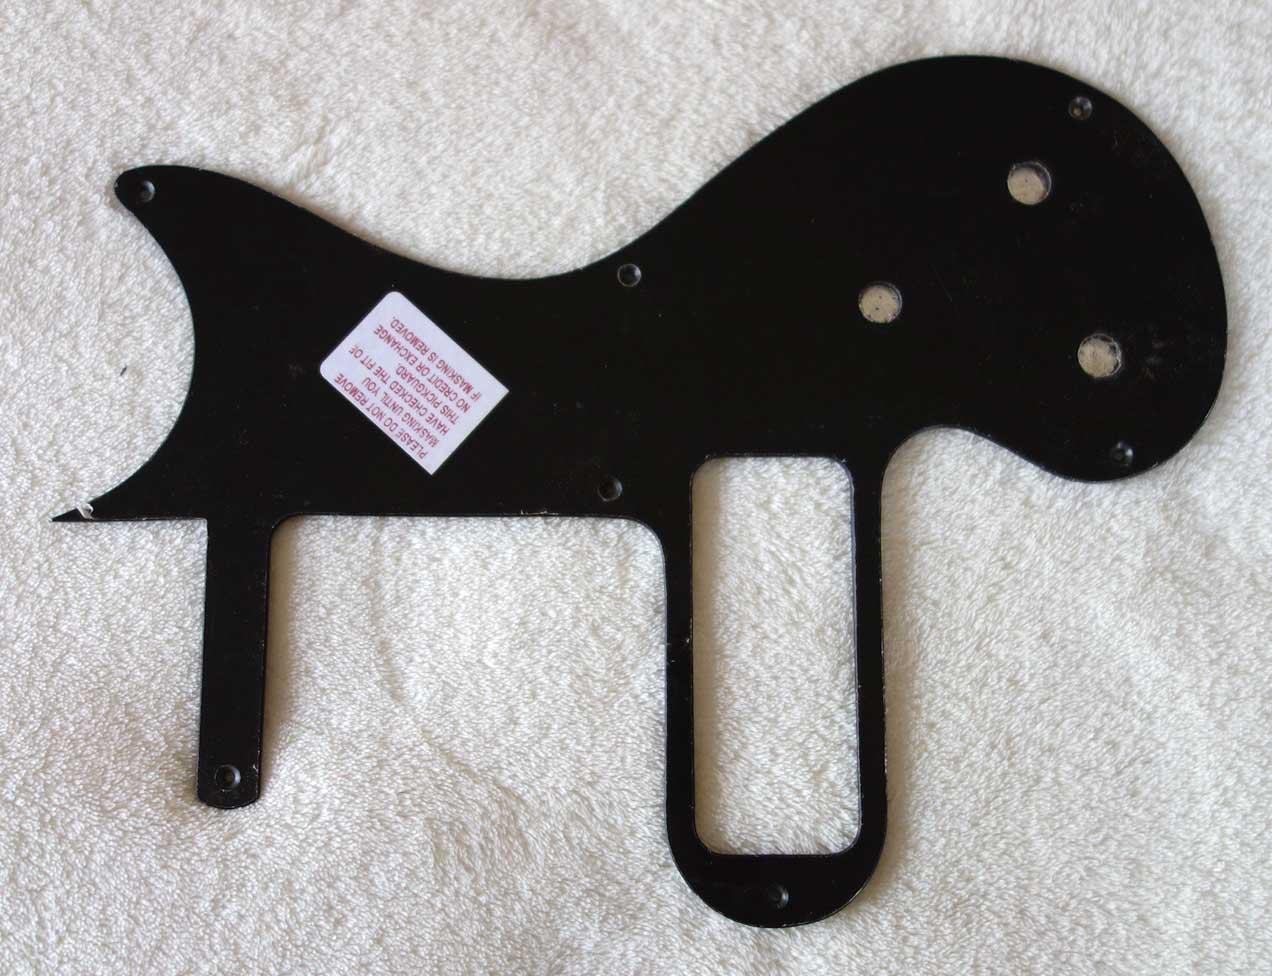 Chandler Pickguard for Gibson Melody Maker 1 PU Soapbar P90 Mod, 1960-1963 MMs